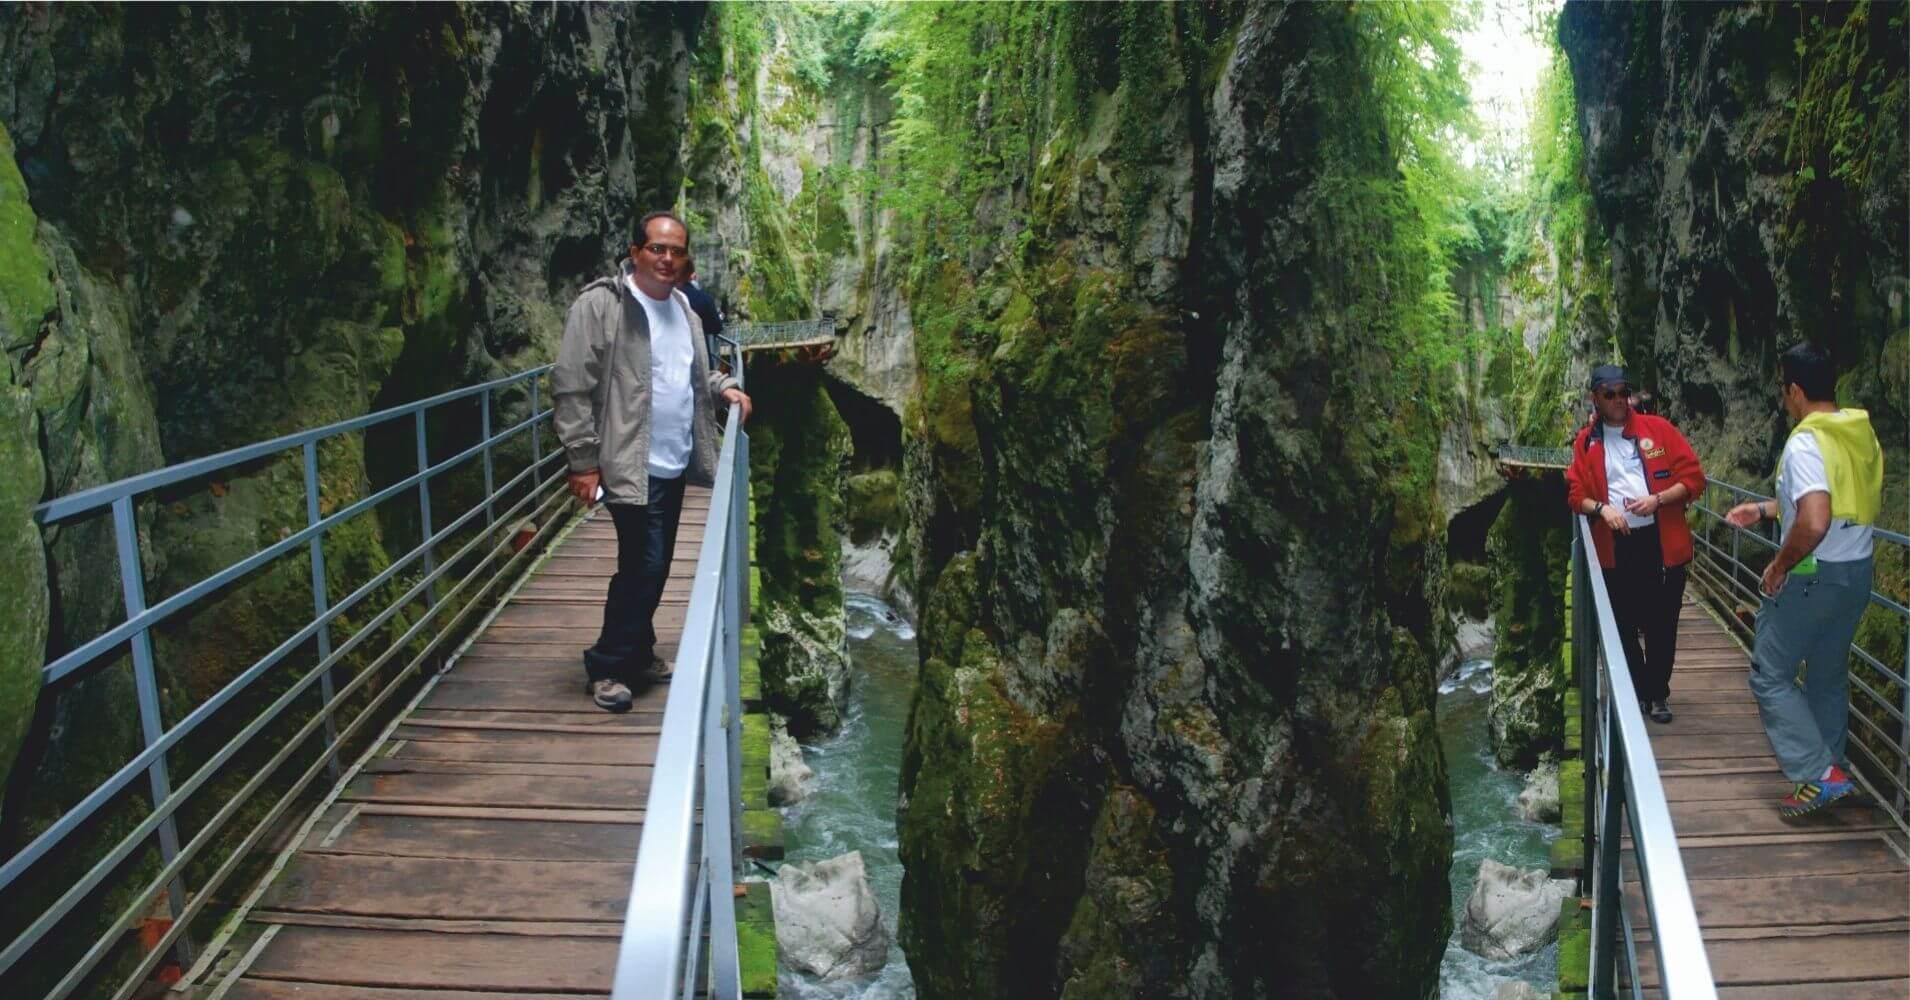 Estrechos de Gorges du Fier. Lovagni, Alta Saboya. Auvernia-Ródano-Alpes. Francia.